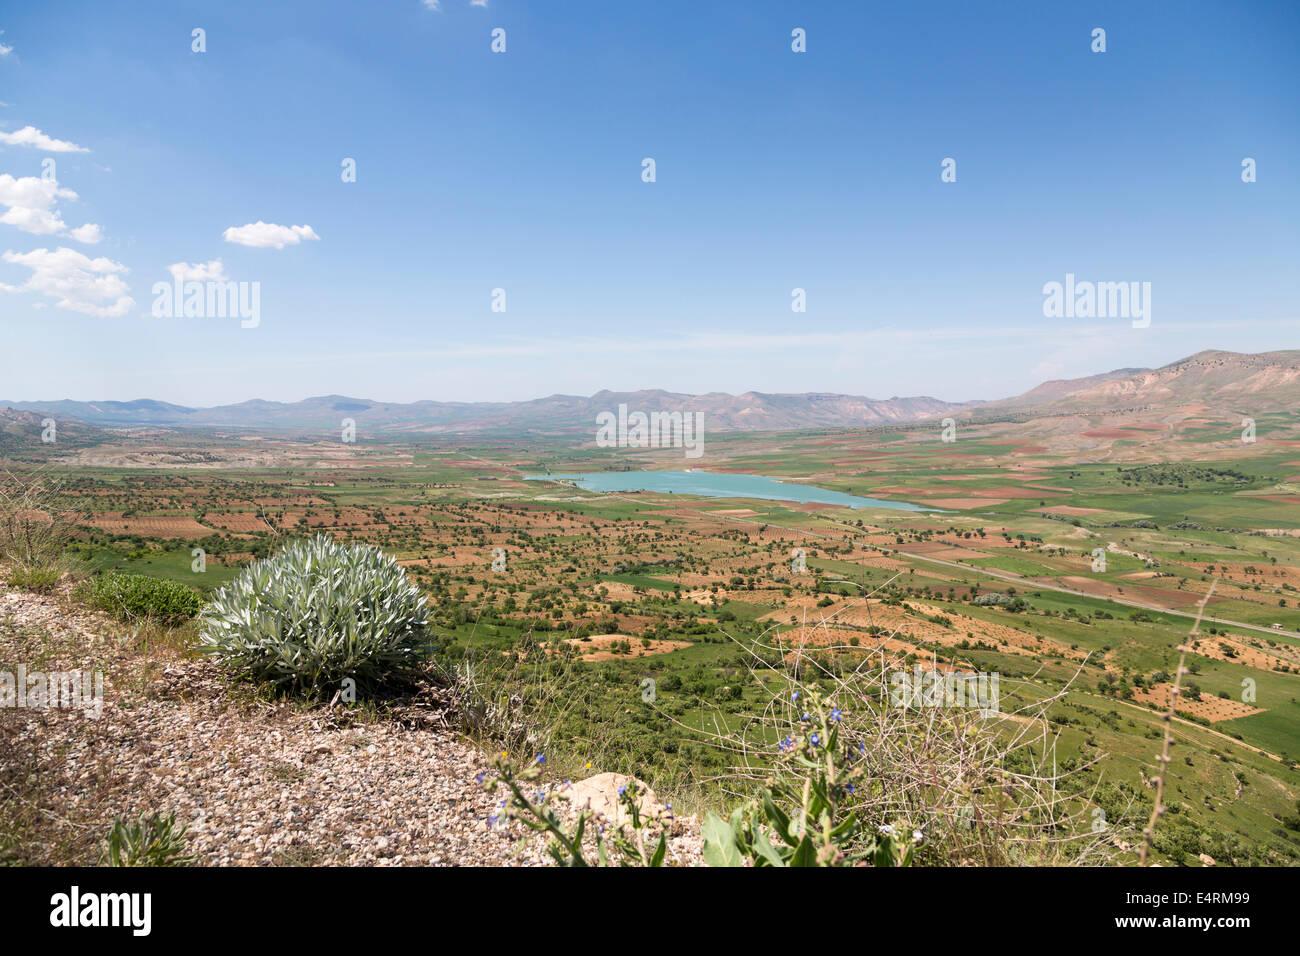 landscape with lake between Hasankeyf and Mardin, Southeastern Anatolia, Turkey - Stock Image